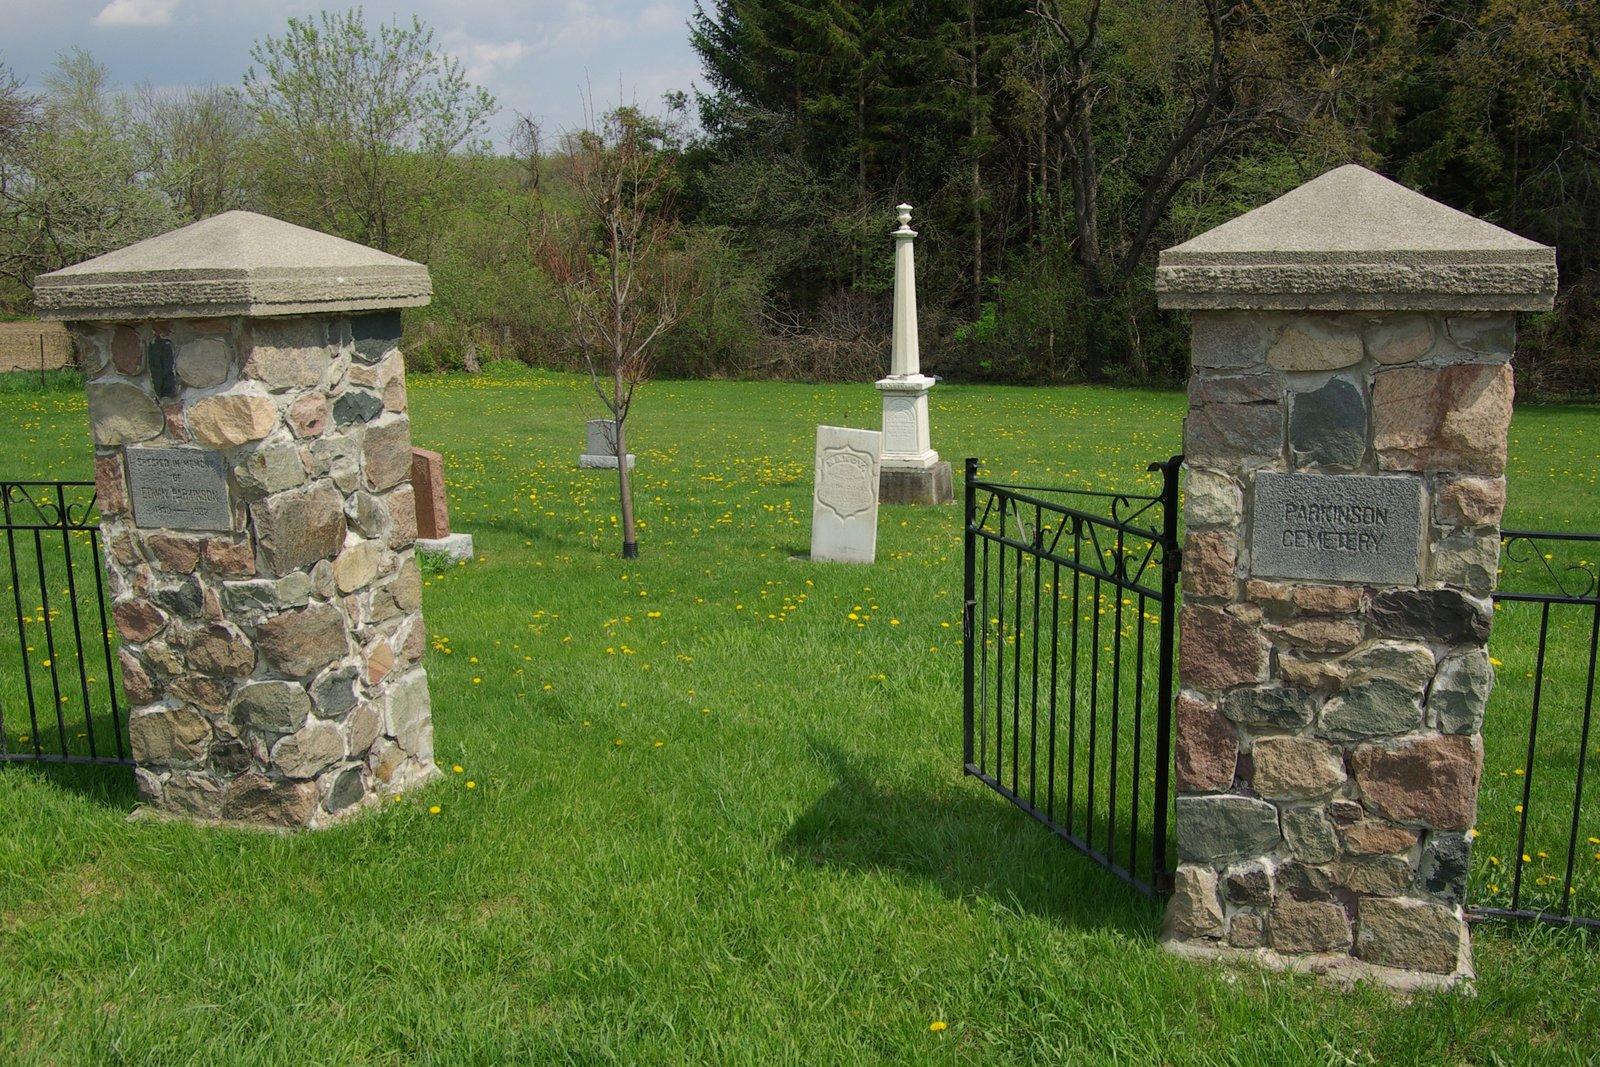 Parkinson Cemetery